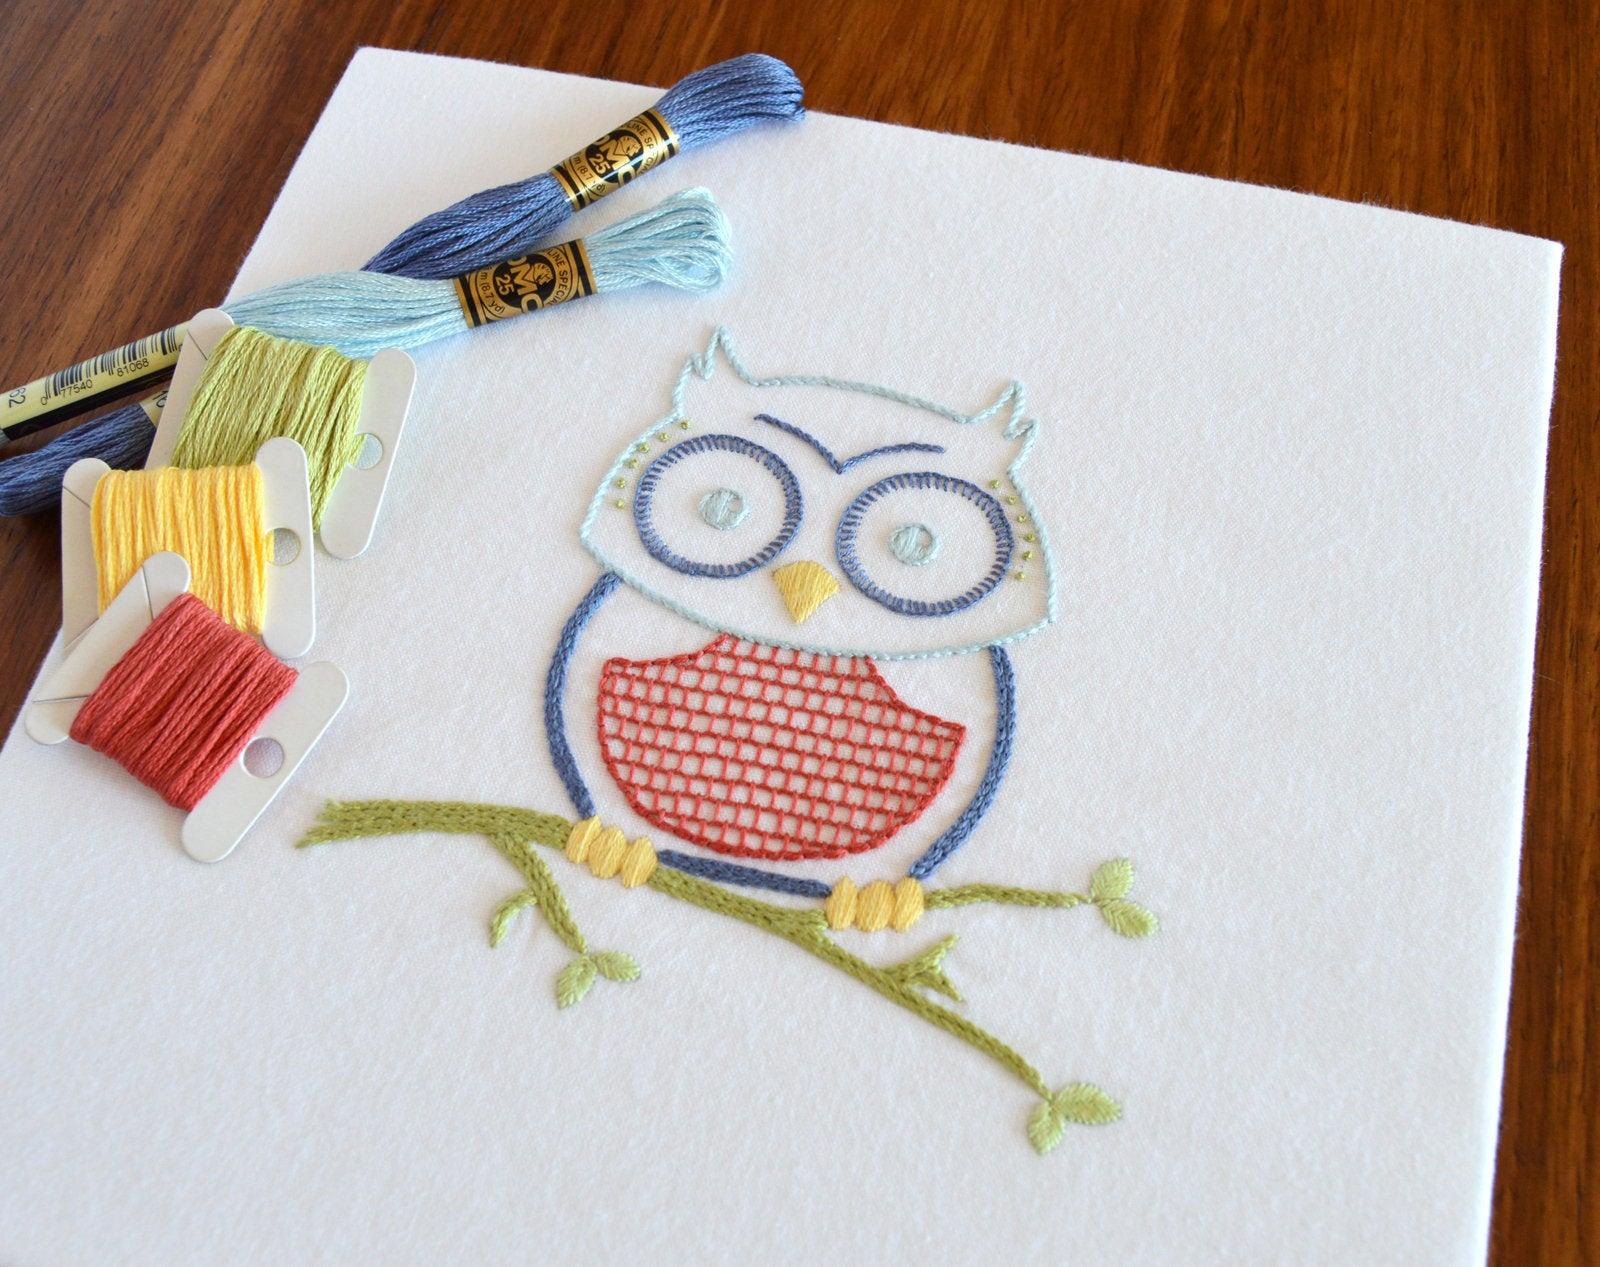 Embroidery Bird Patterns Owlish Hand Embroidery Pattern Modern Embroidery Bird Embroidery Owl Birds Embroidery Patterns Embroidery Pdf Pdf Pattern